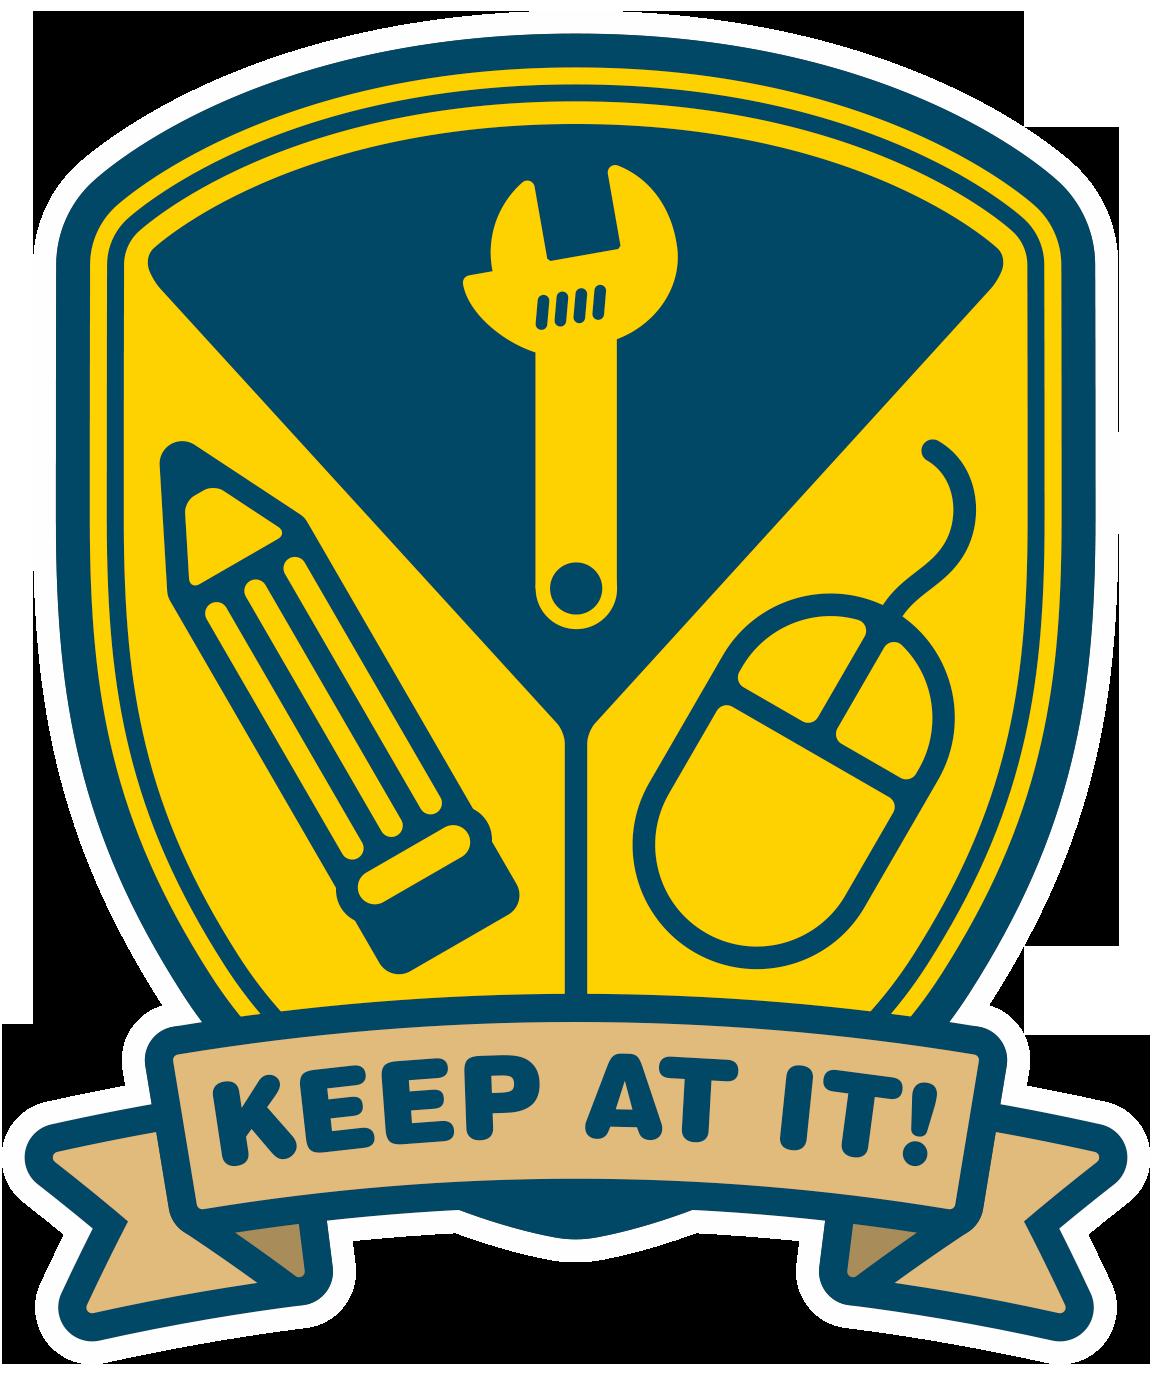 Motivation clipart sticker. Keep at it peter